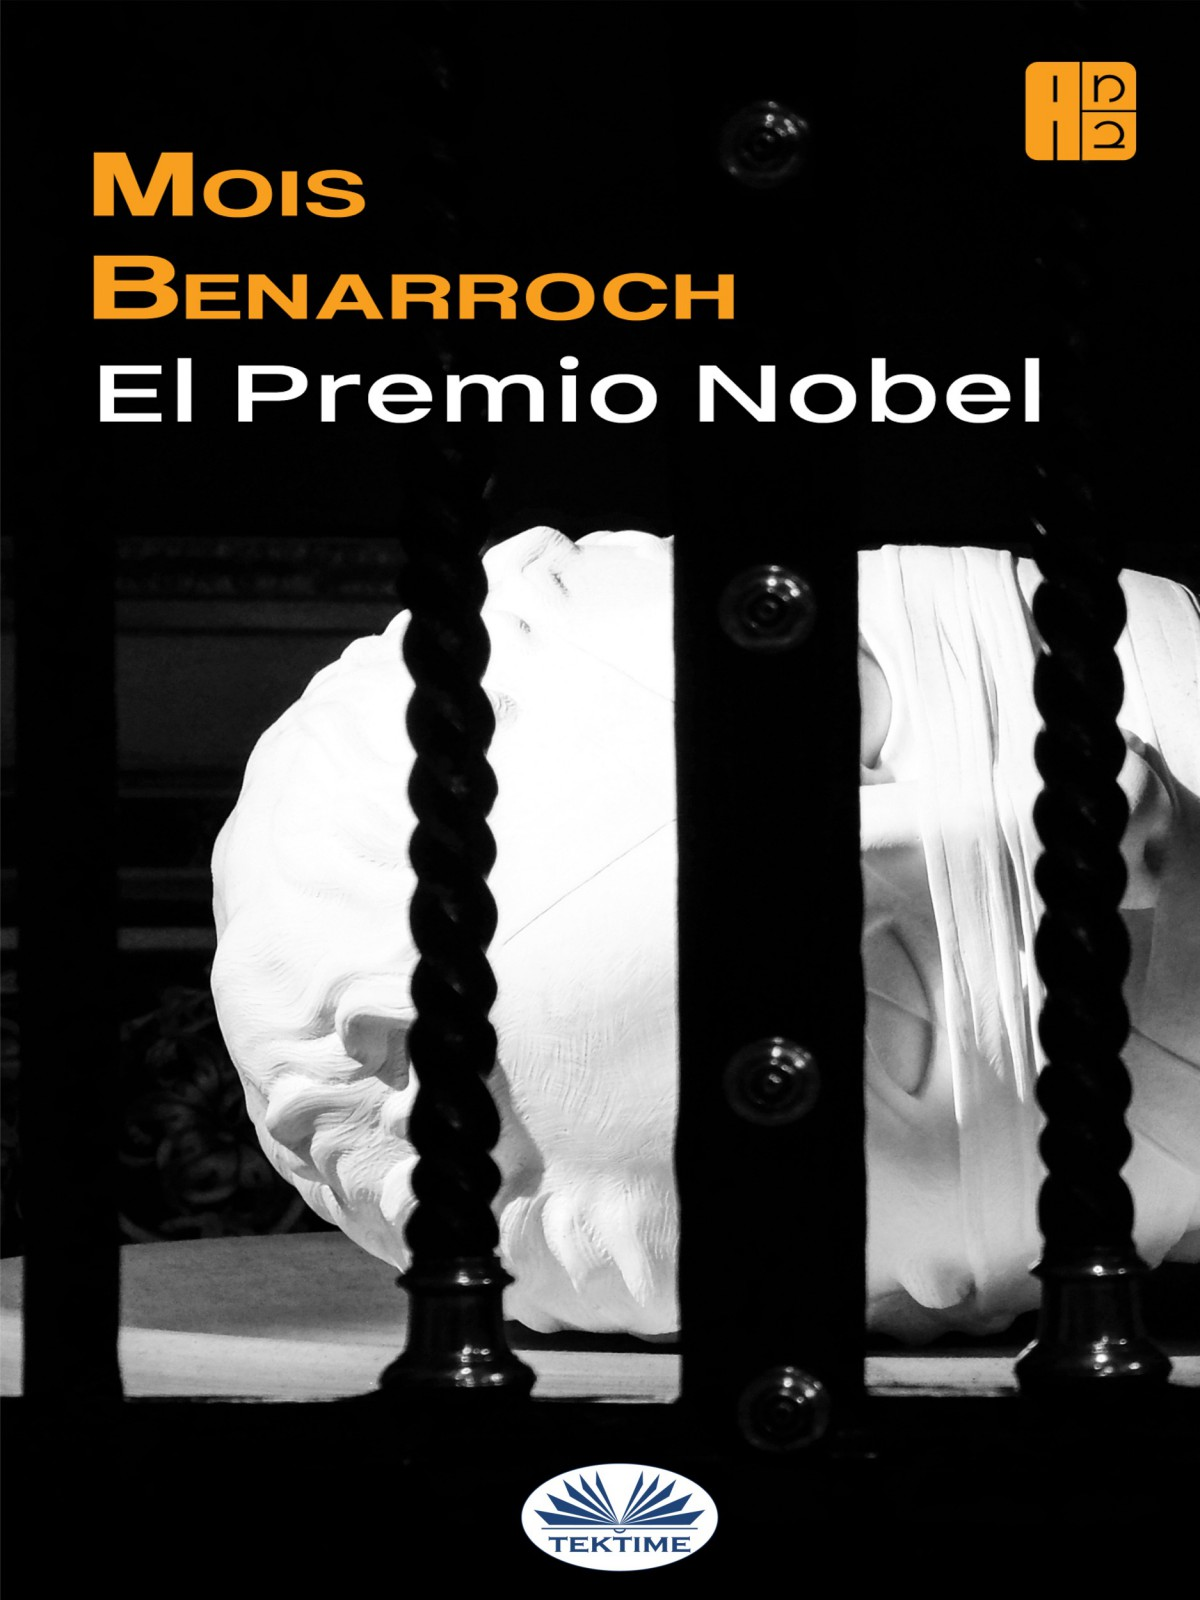 Mois Benarroch El Premio Nobel